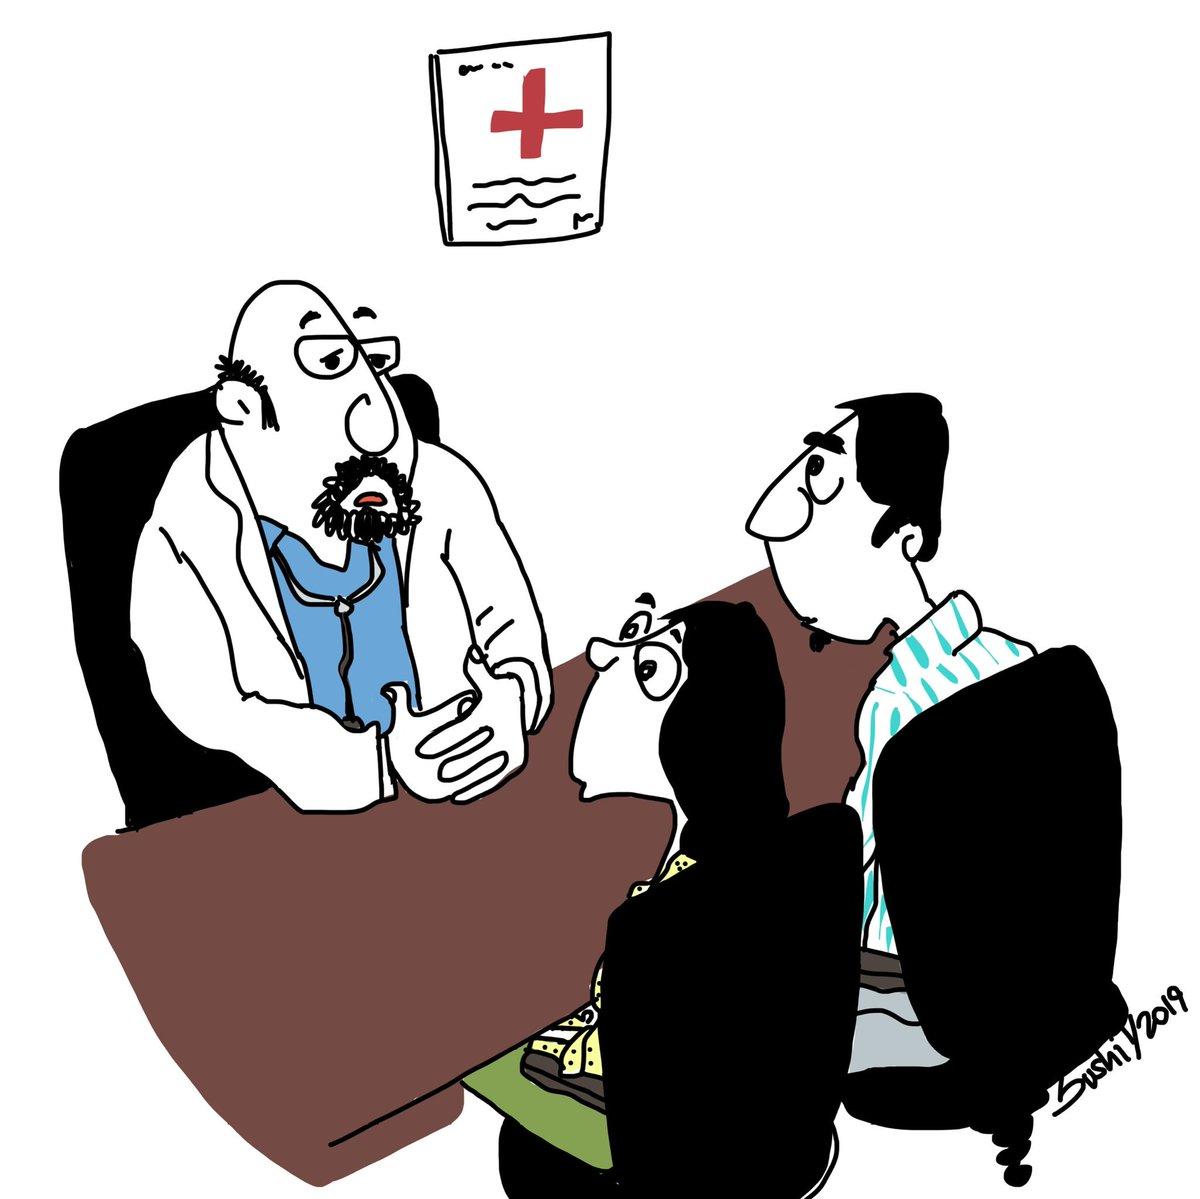 "Funny Cartoon Hospital Pics doodlewala on twitter: """"this is a self-help hospital. you"